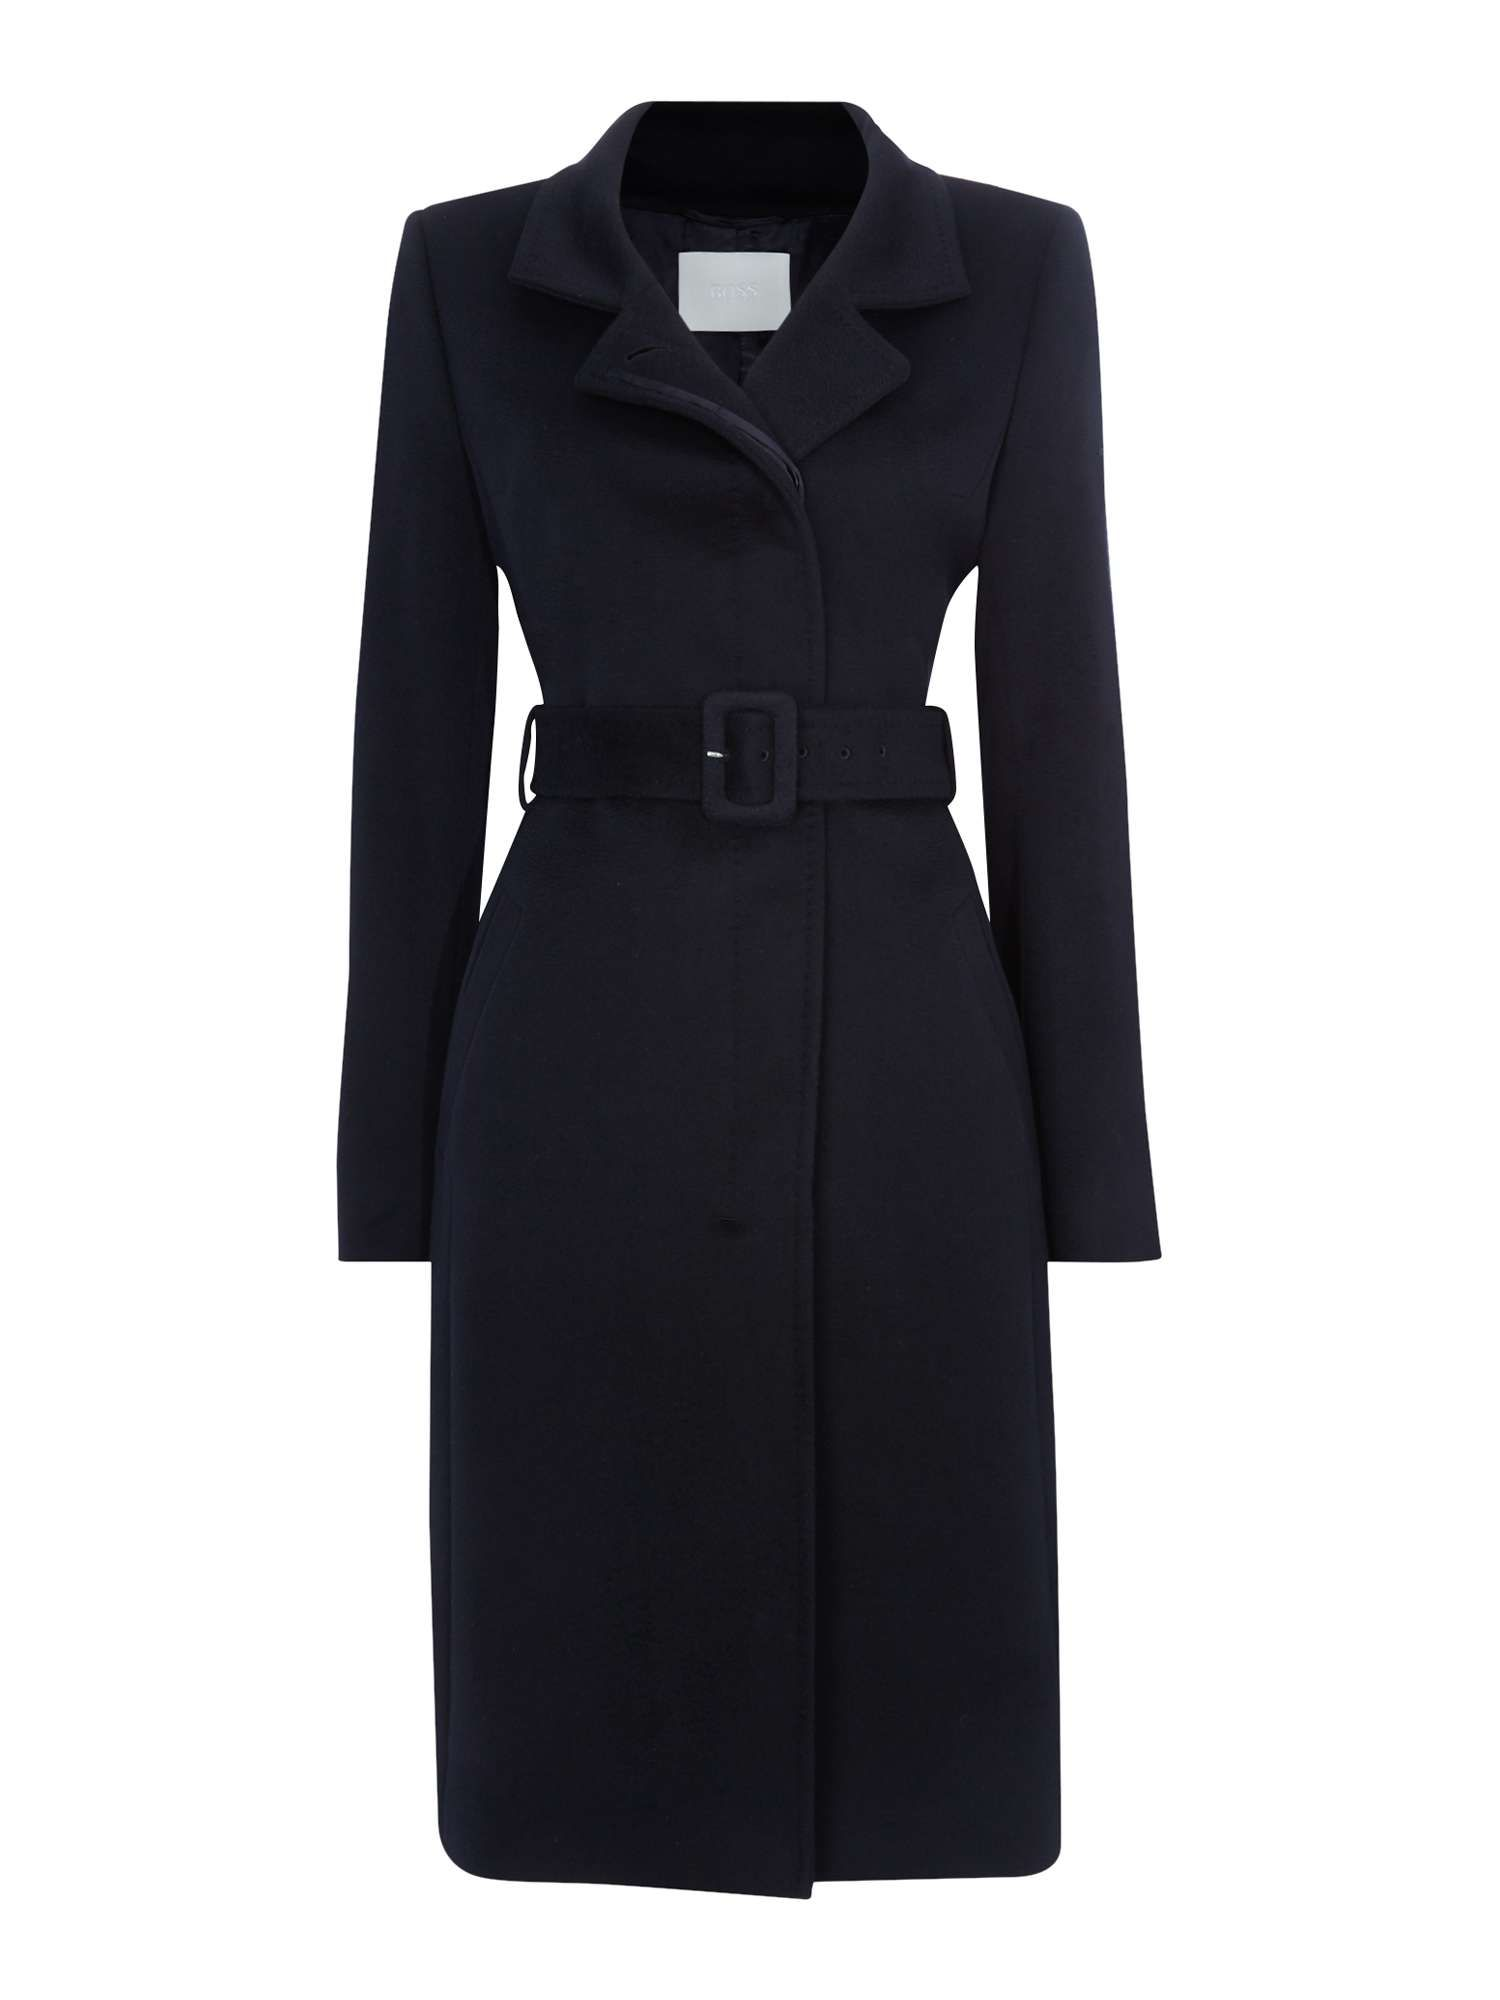 ad1f5e24dc Hugo Boss Cetiva Belted Wool Coat - House of Fraser